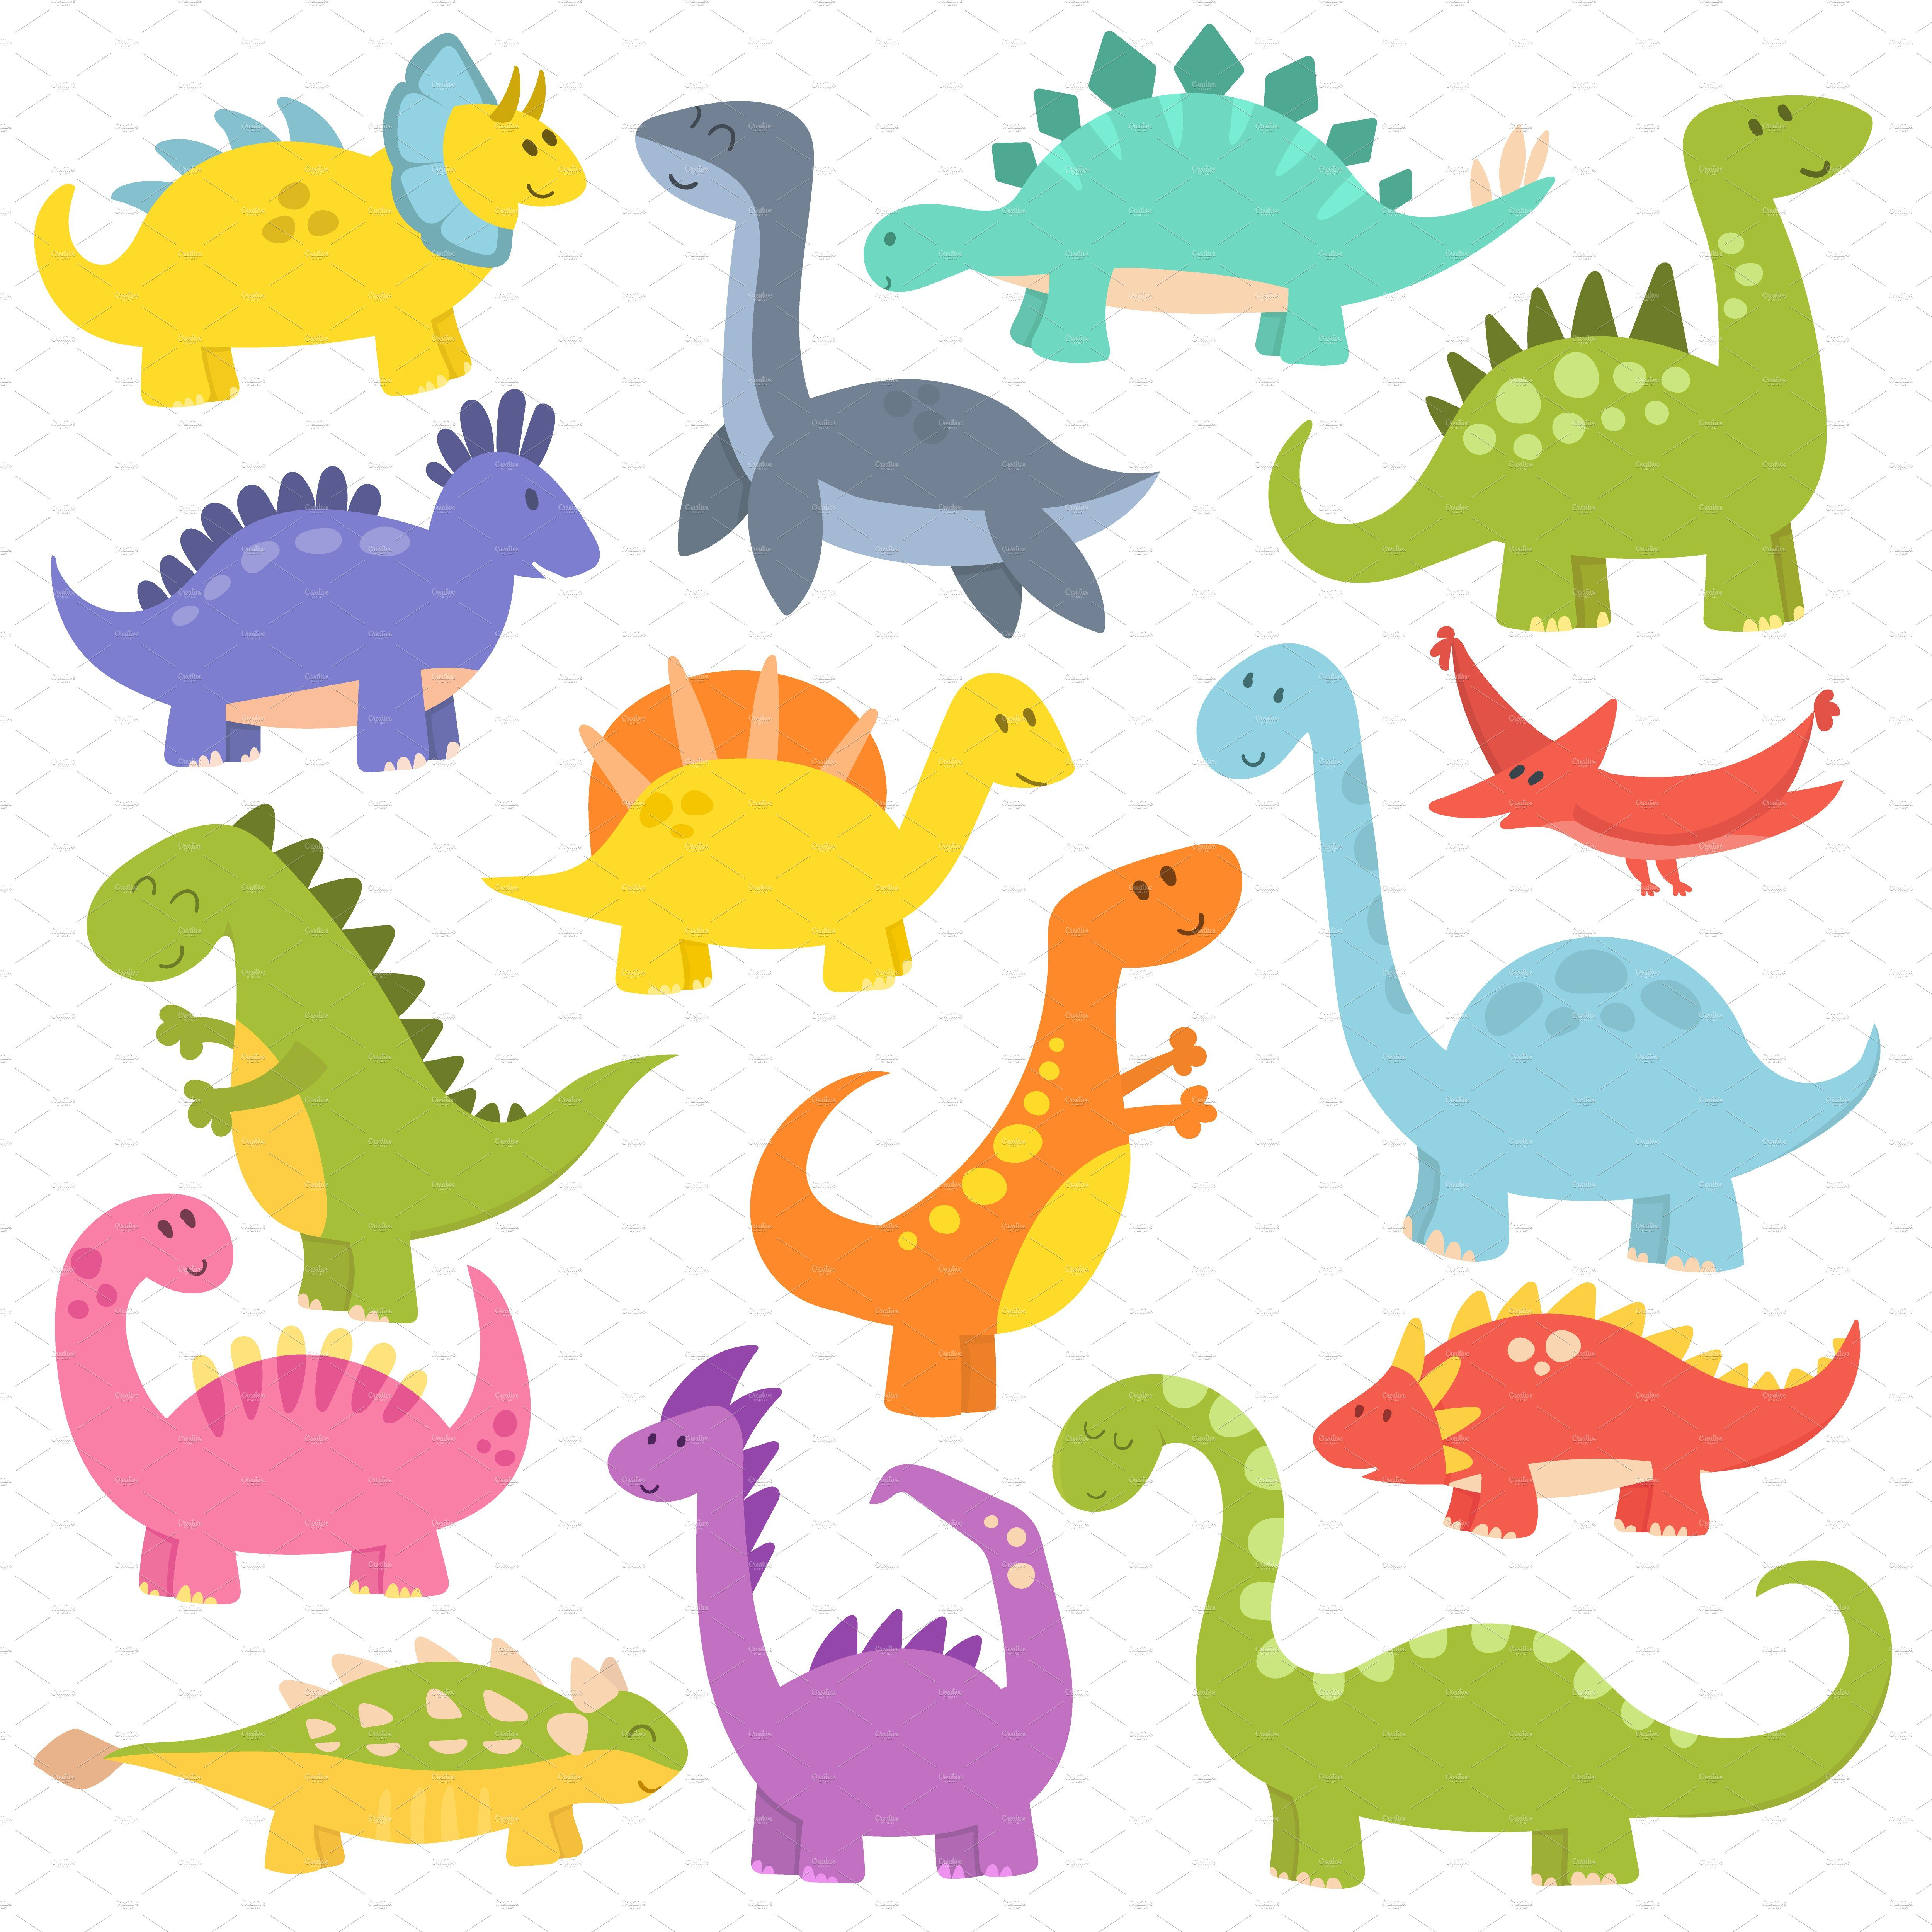 Cute Cartoon Dinosaurs Vector Dinosaur Illustration Cute Dinosaur Cartoon Dinosaur